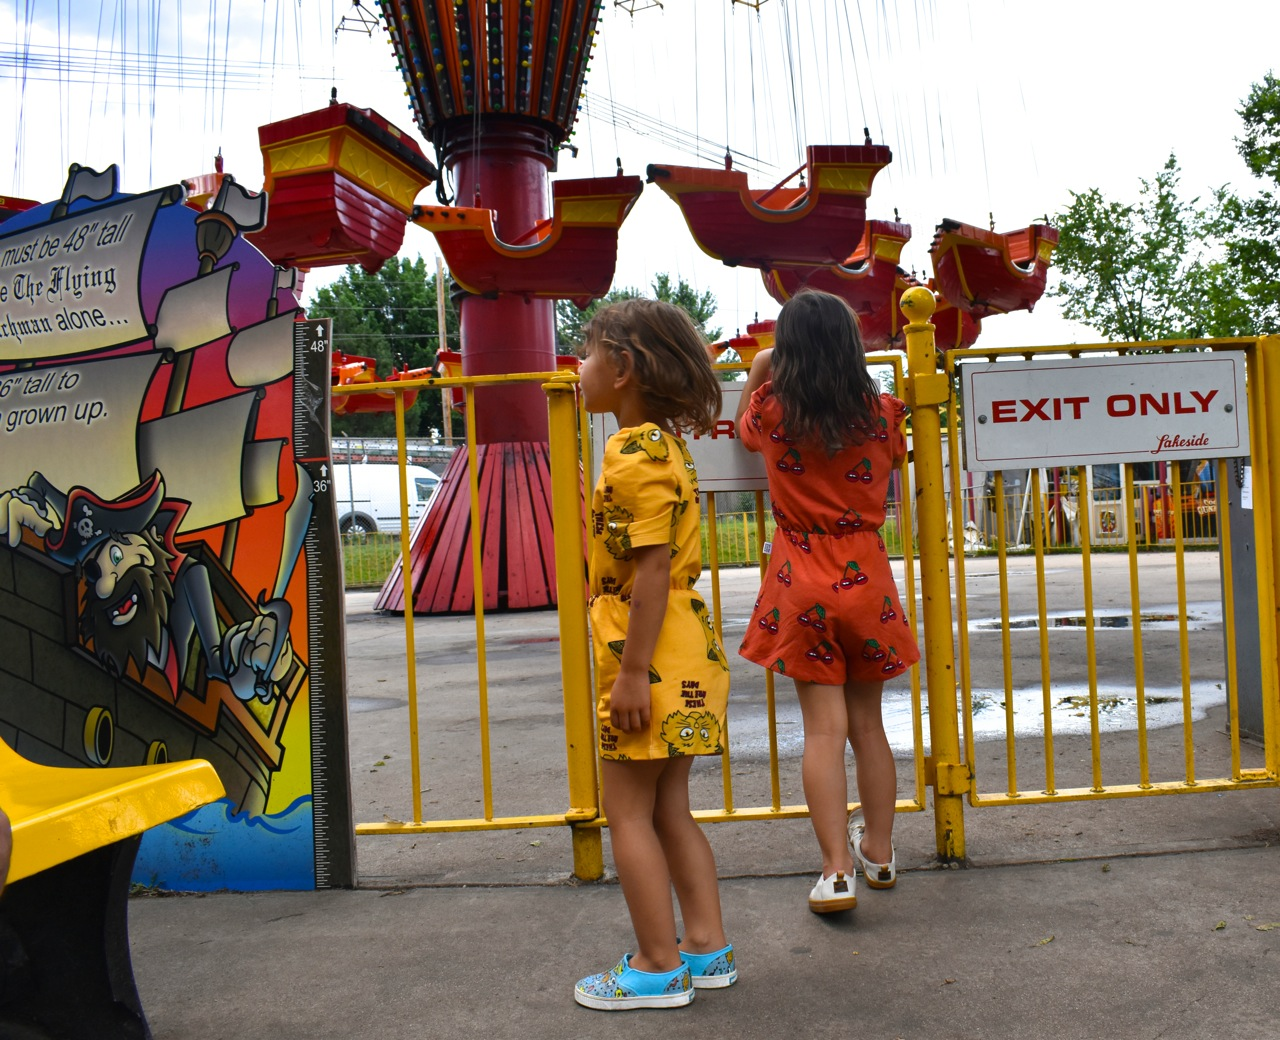 Lakeside Amusement Park Denver July 2019 45.jpg